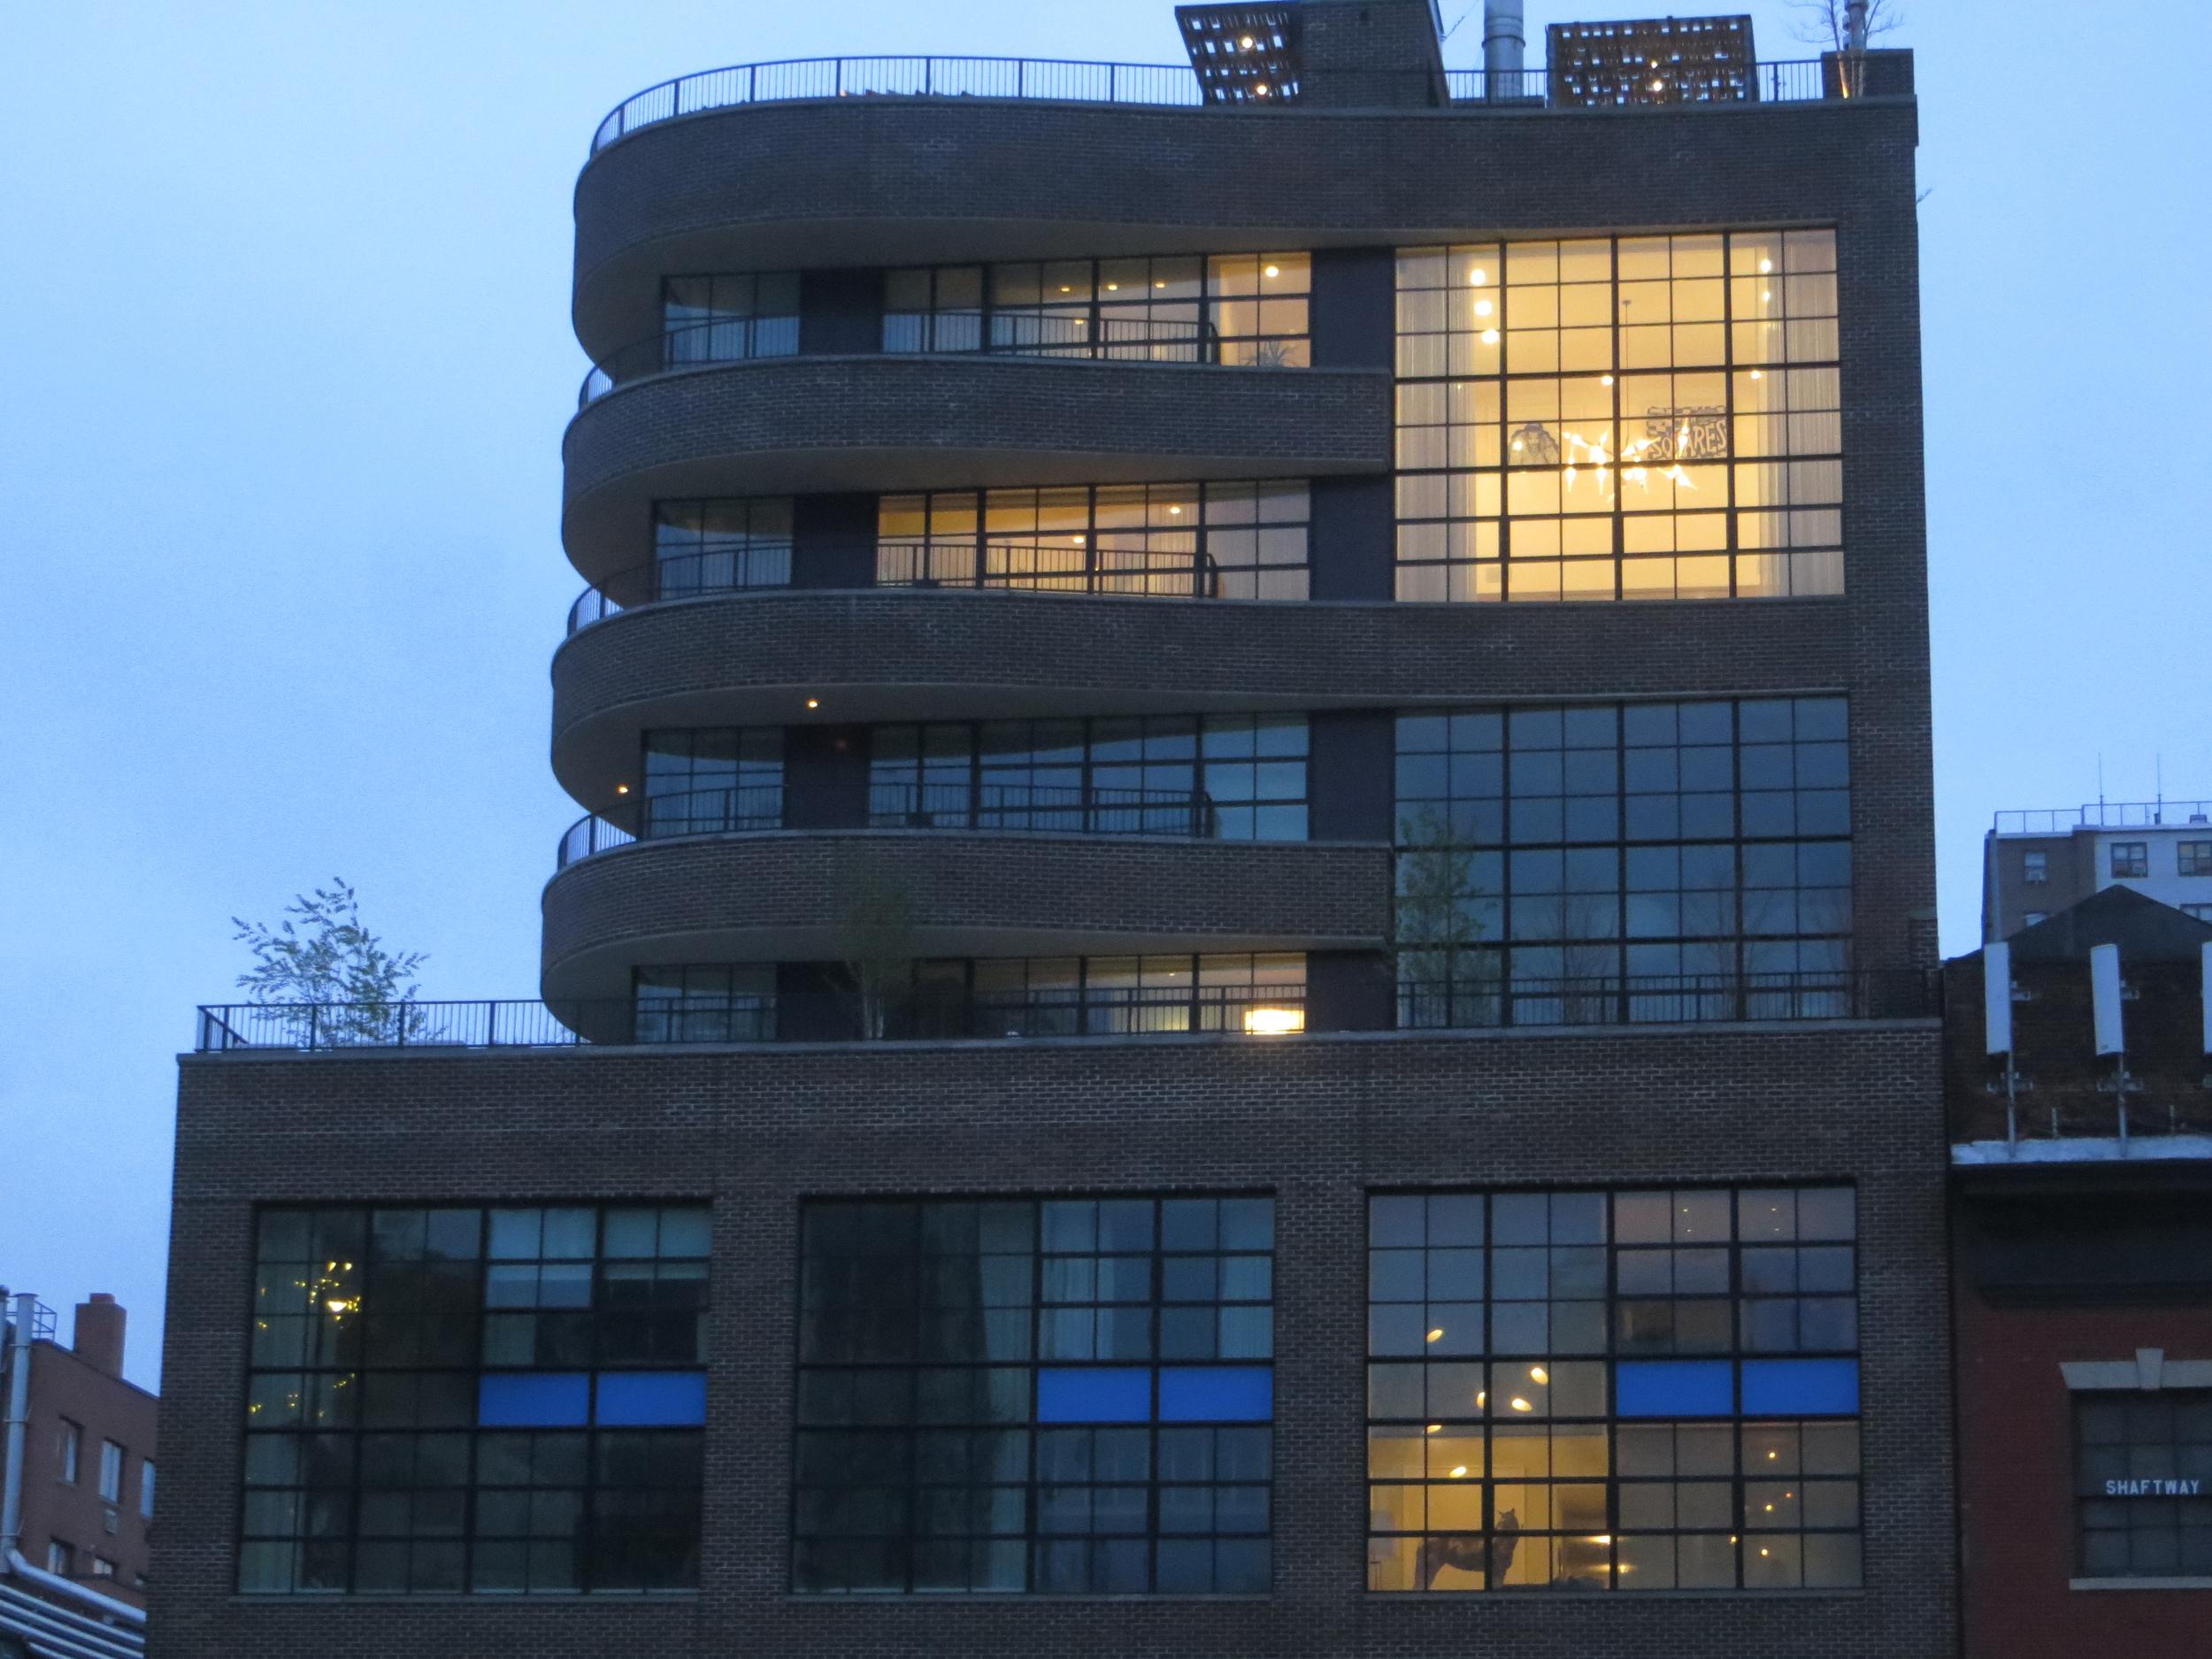 Rich people's windows